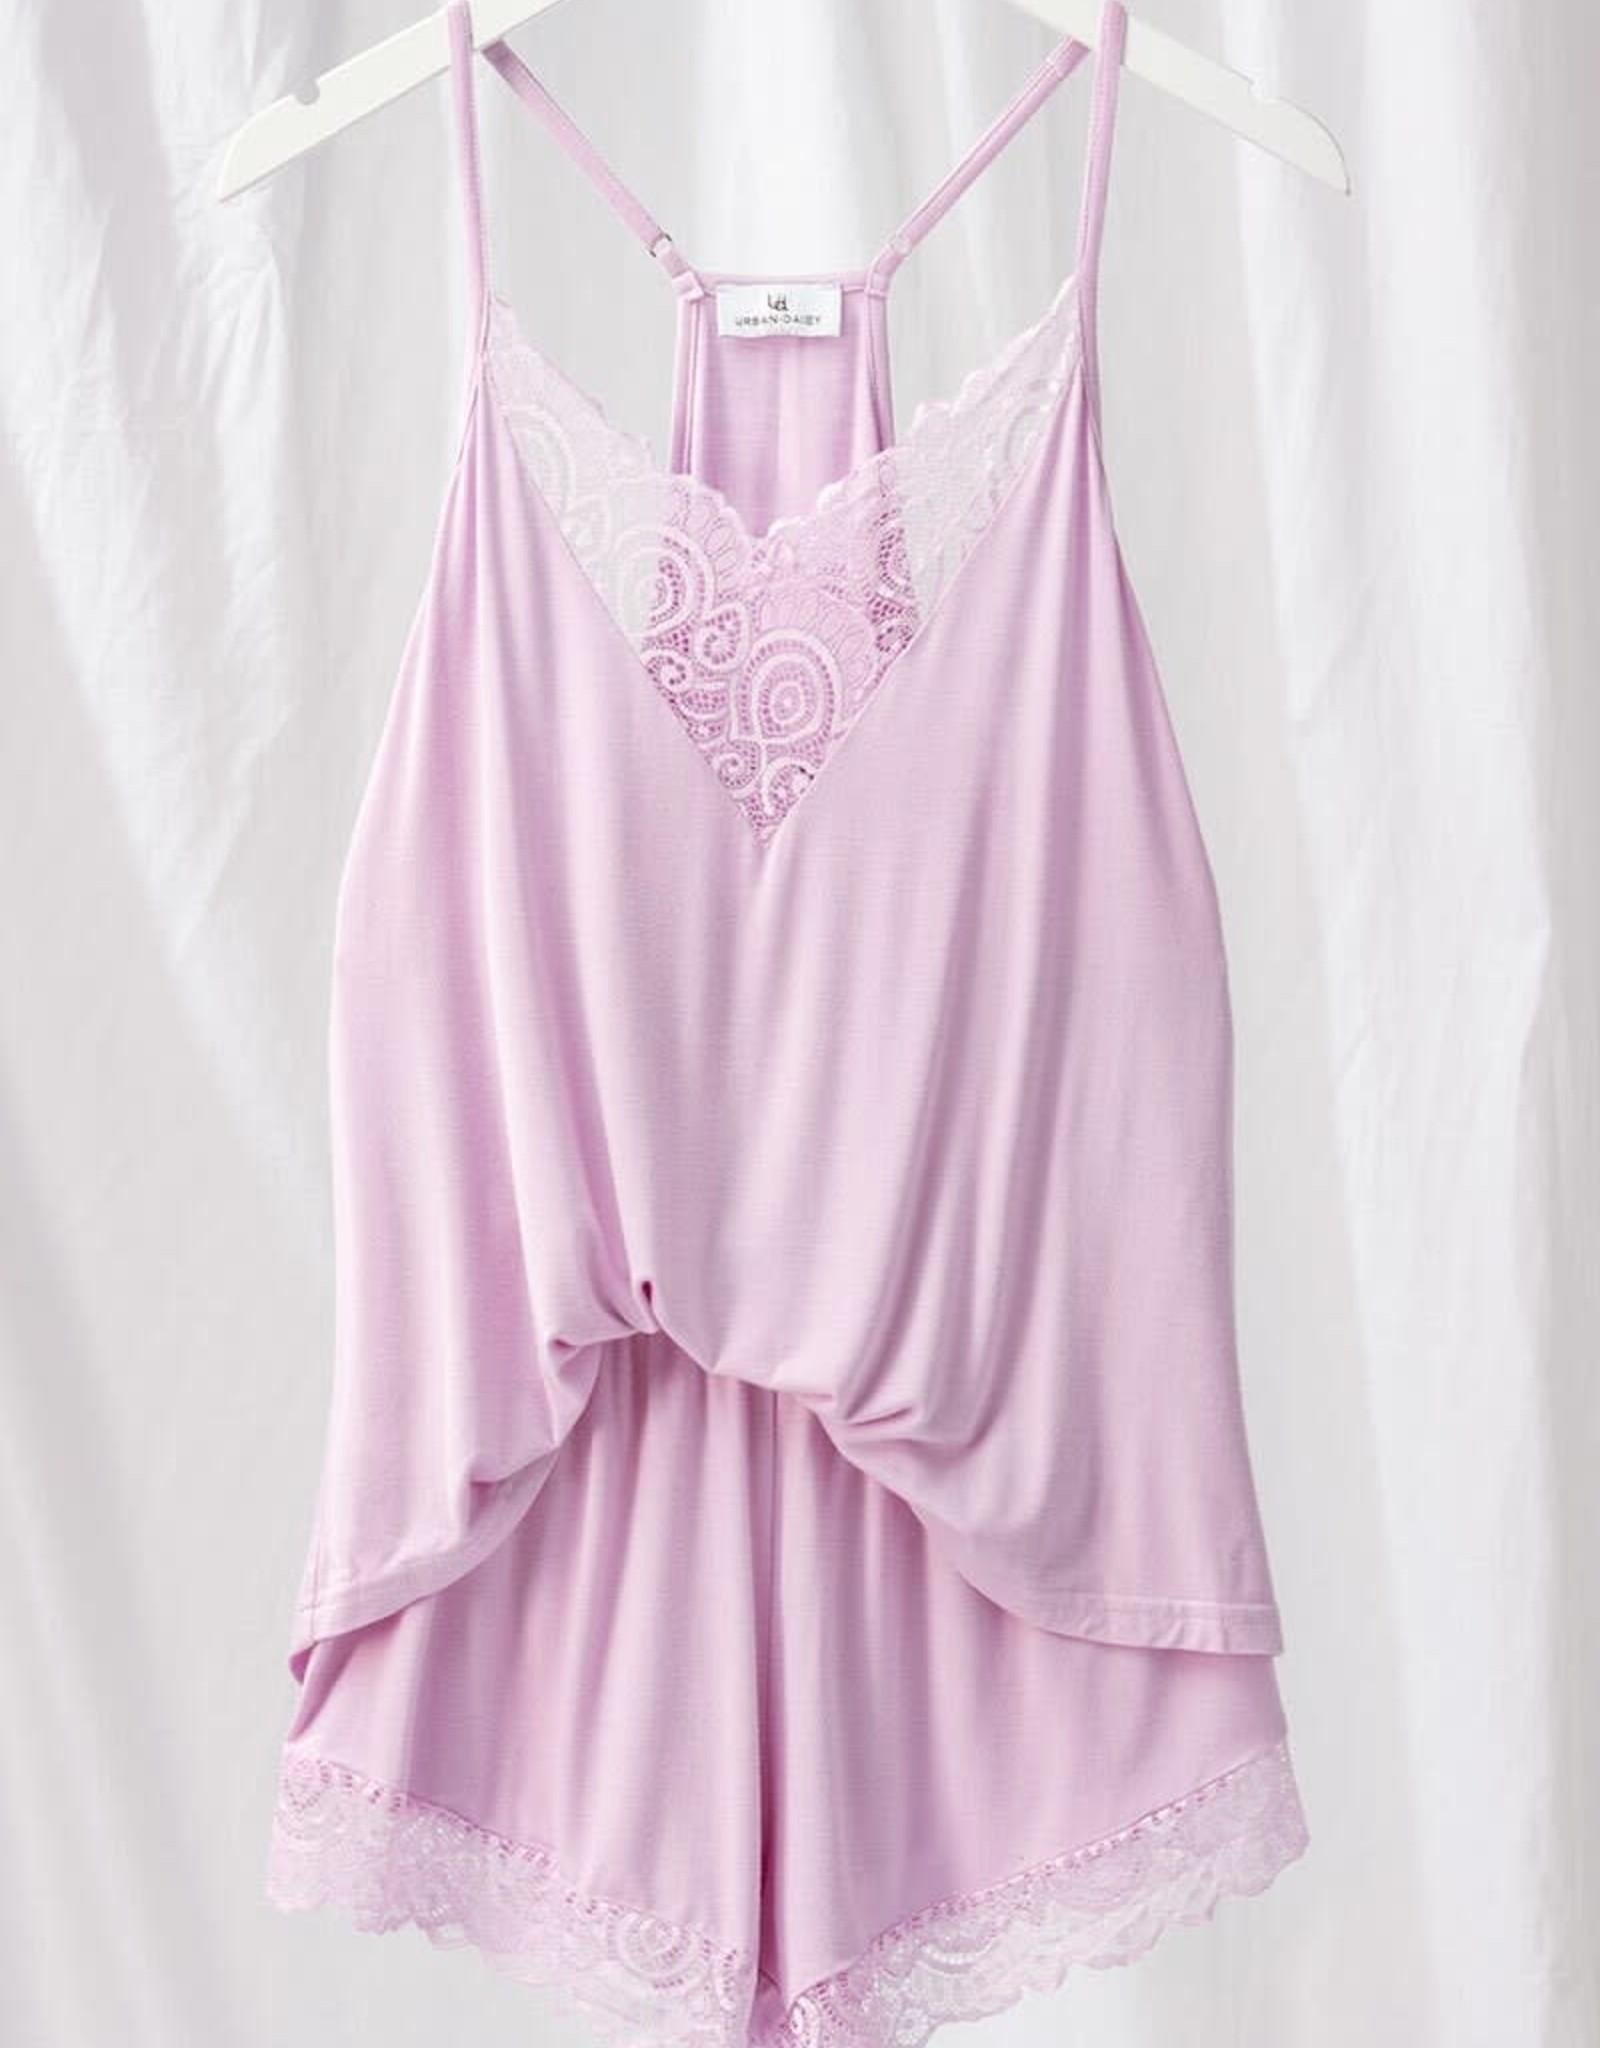 Miss Bliss Lace Cami Pajama Set- Lavender